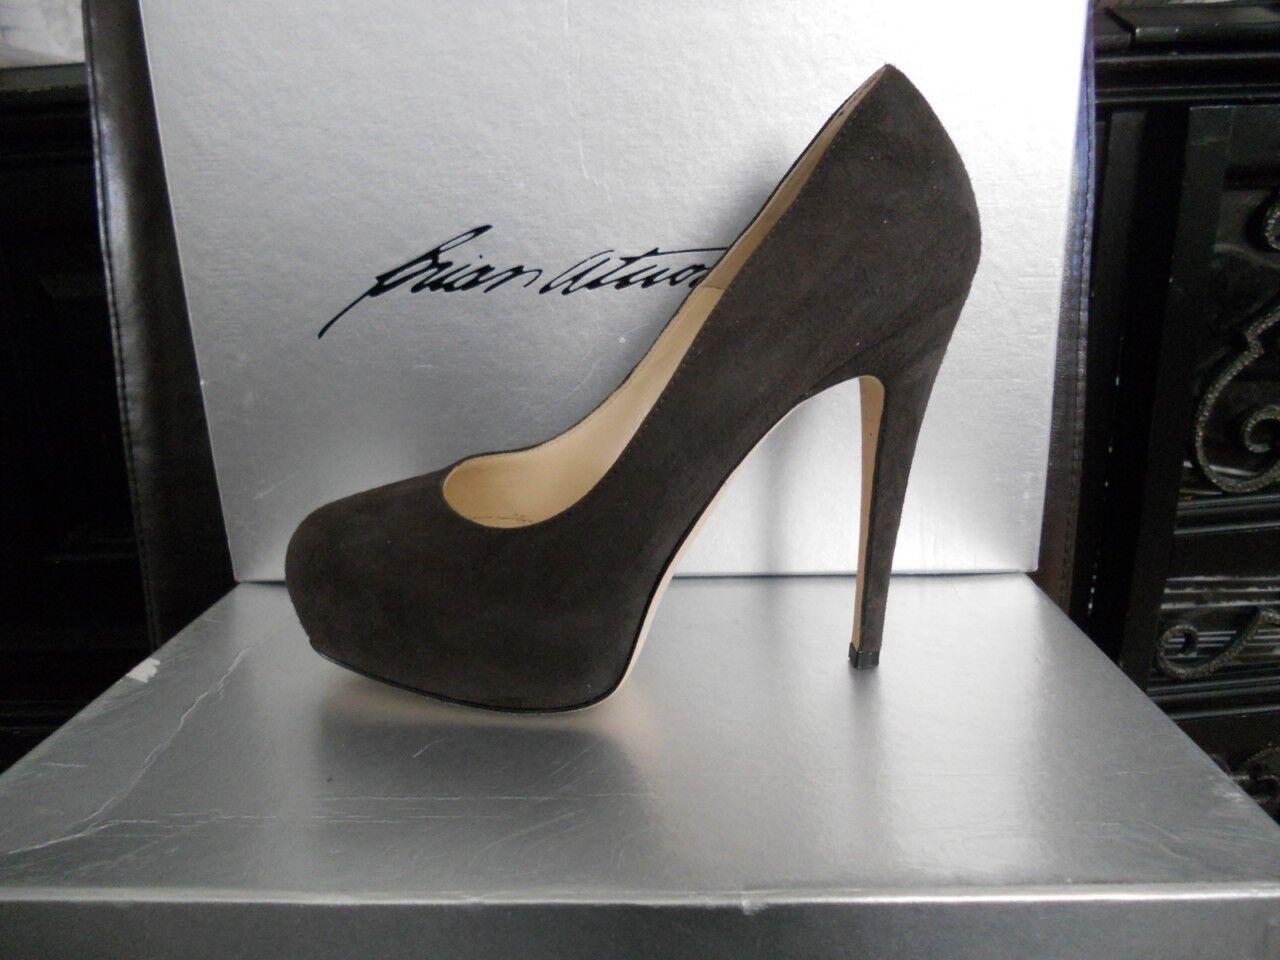 Brian Atwood MANIAC Suede Platform High Heel Pumps Shoes Africa Dark Grigio Sz 36